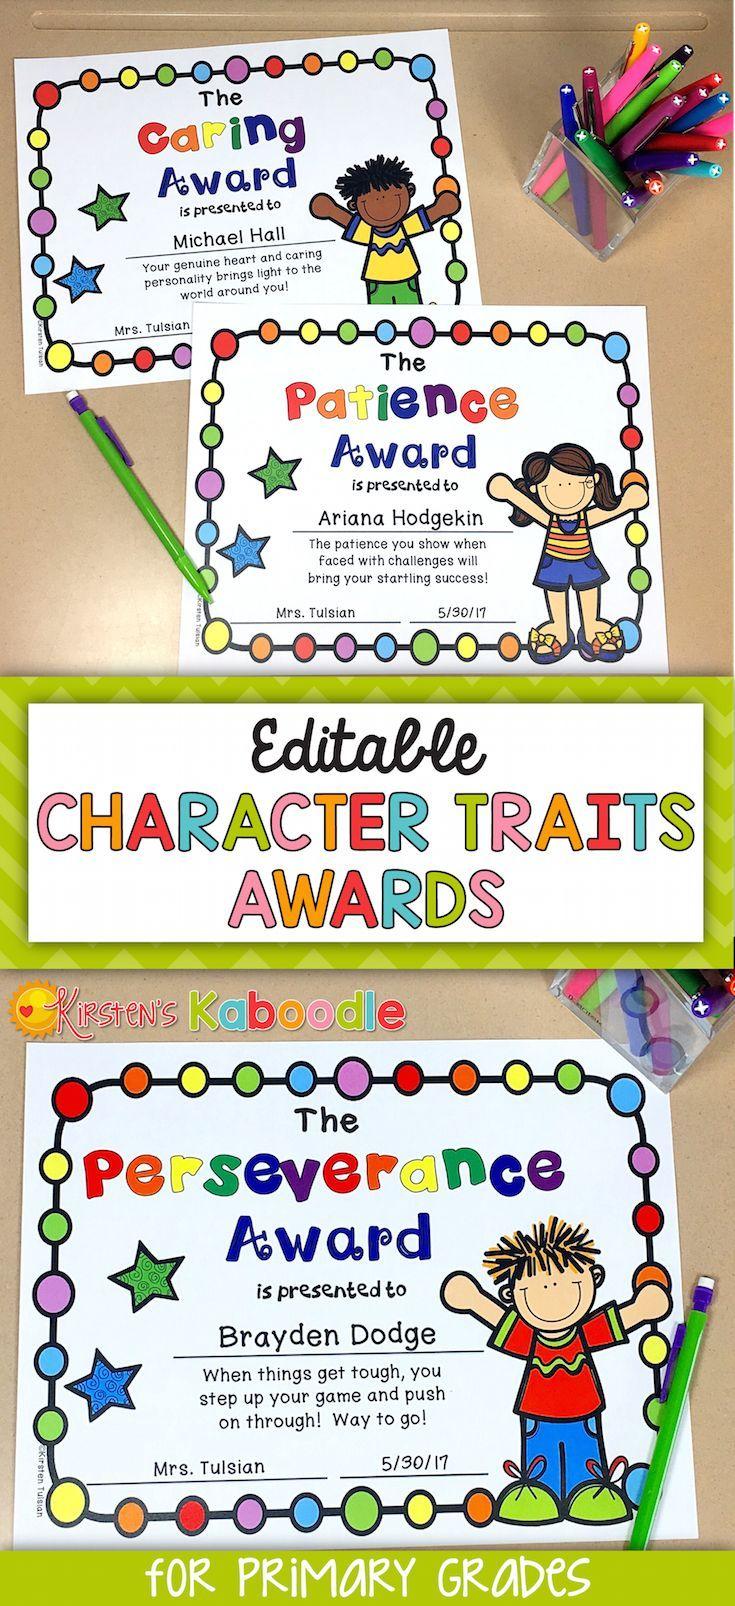 Student Awards 2011: Best 25+ Kids Awards Ideas On Pinterest